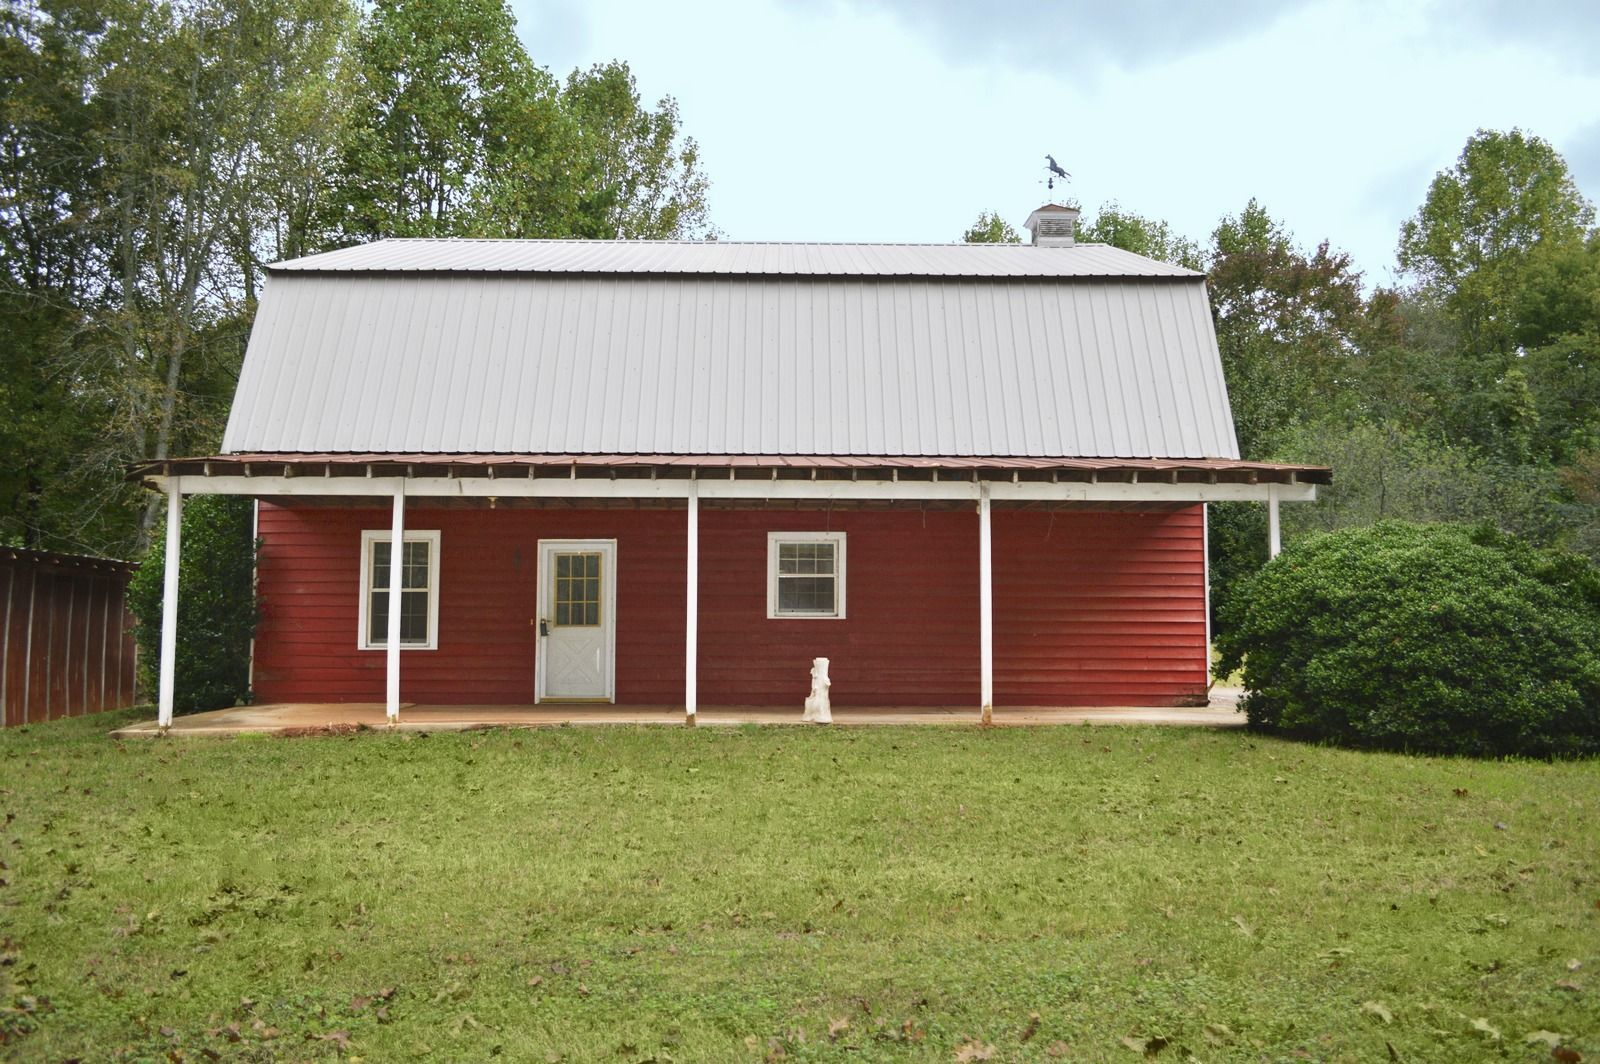 6 Barn Homes For Sale Across America Barns For Sale